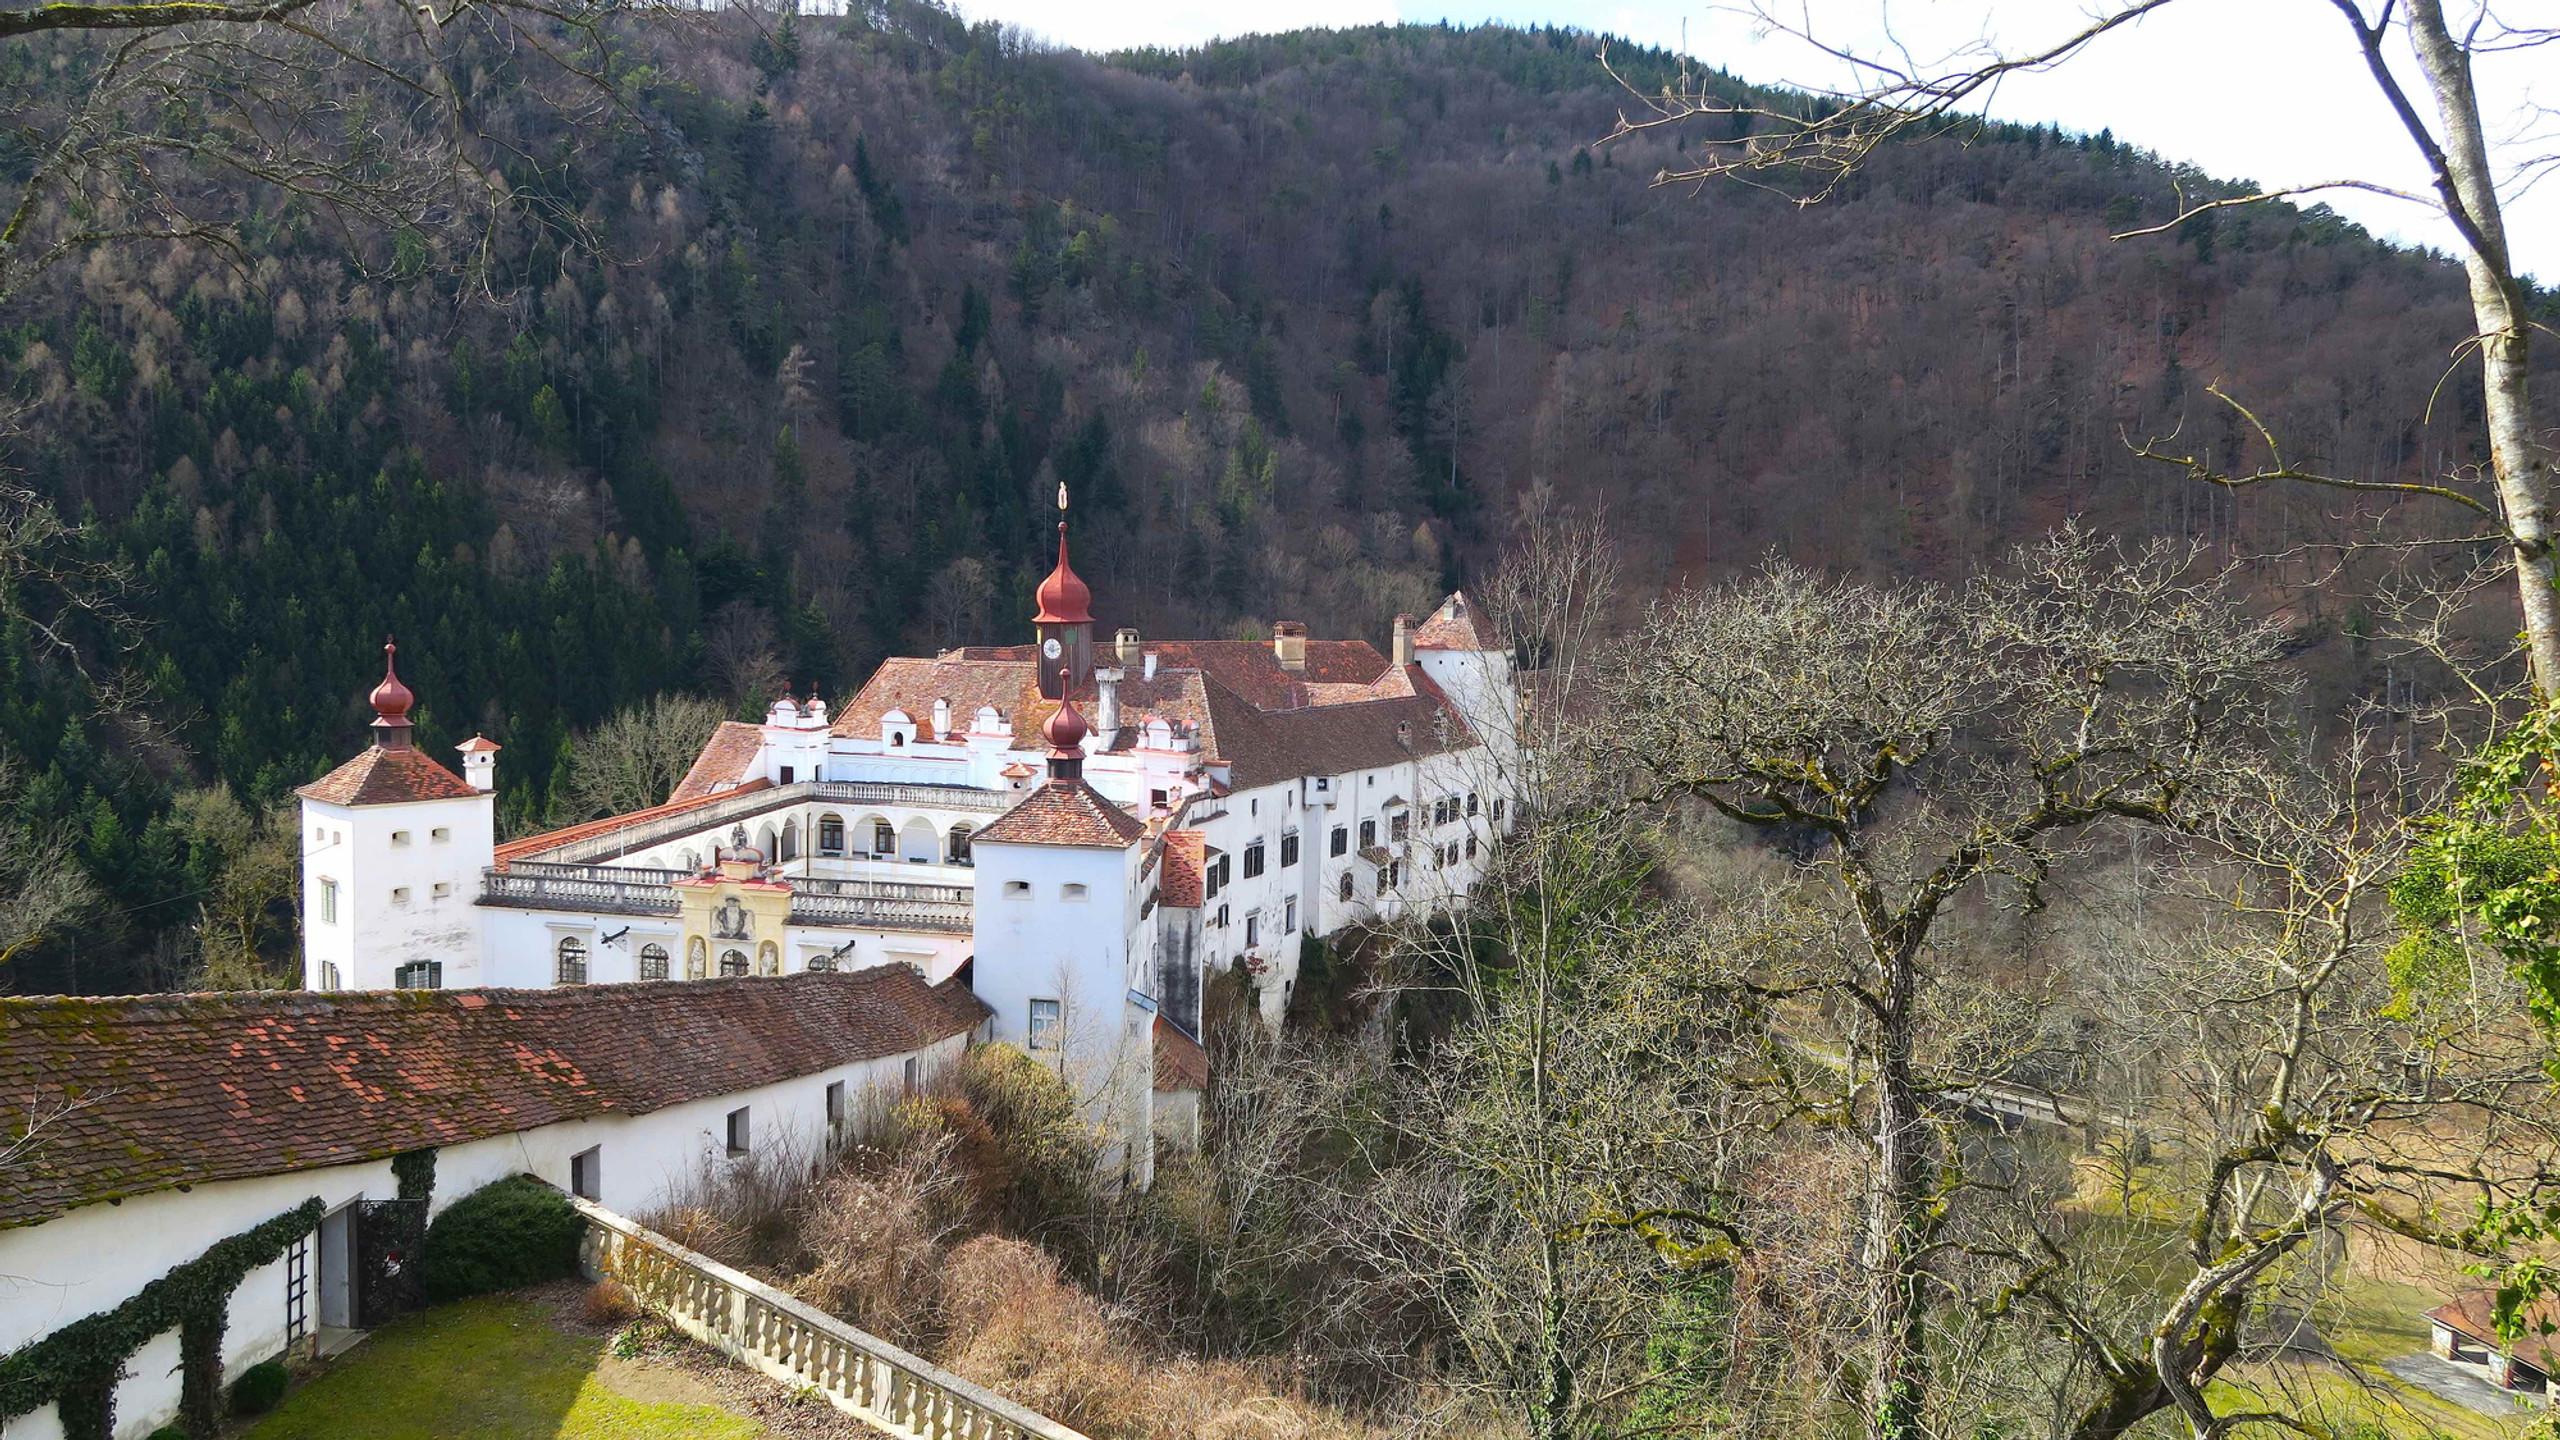 IMG_1597 Schloss Herberstein Austria 2017 Wilhelm W. Kohl kopie